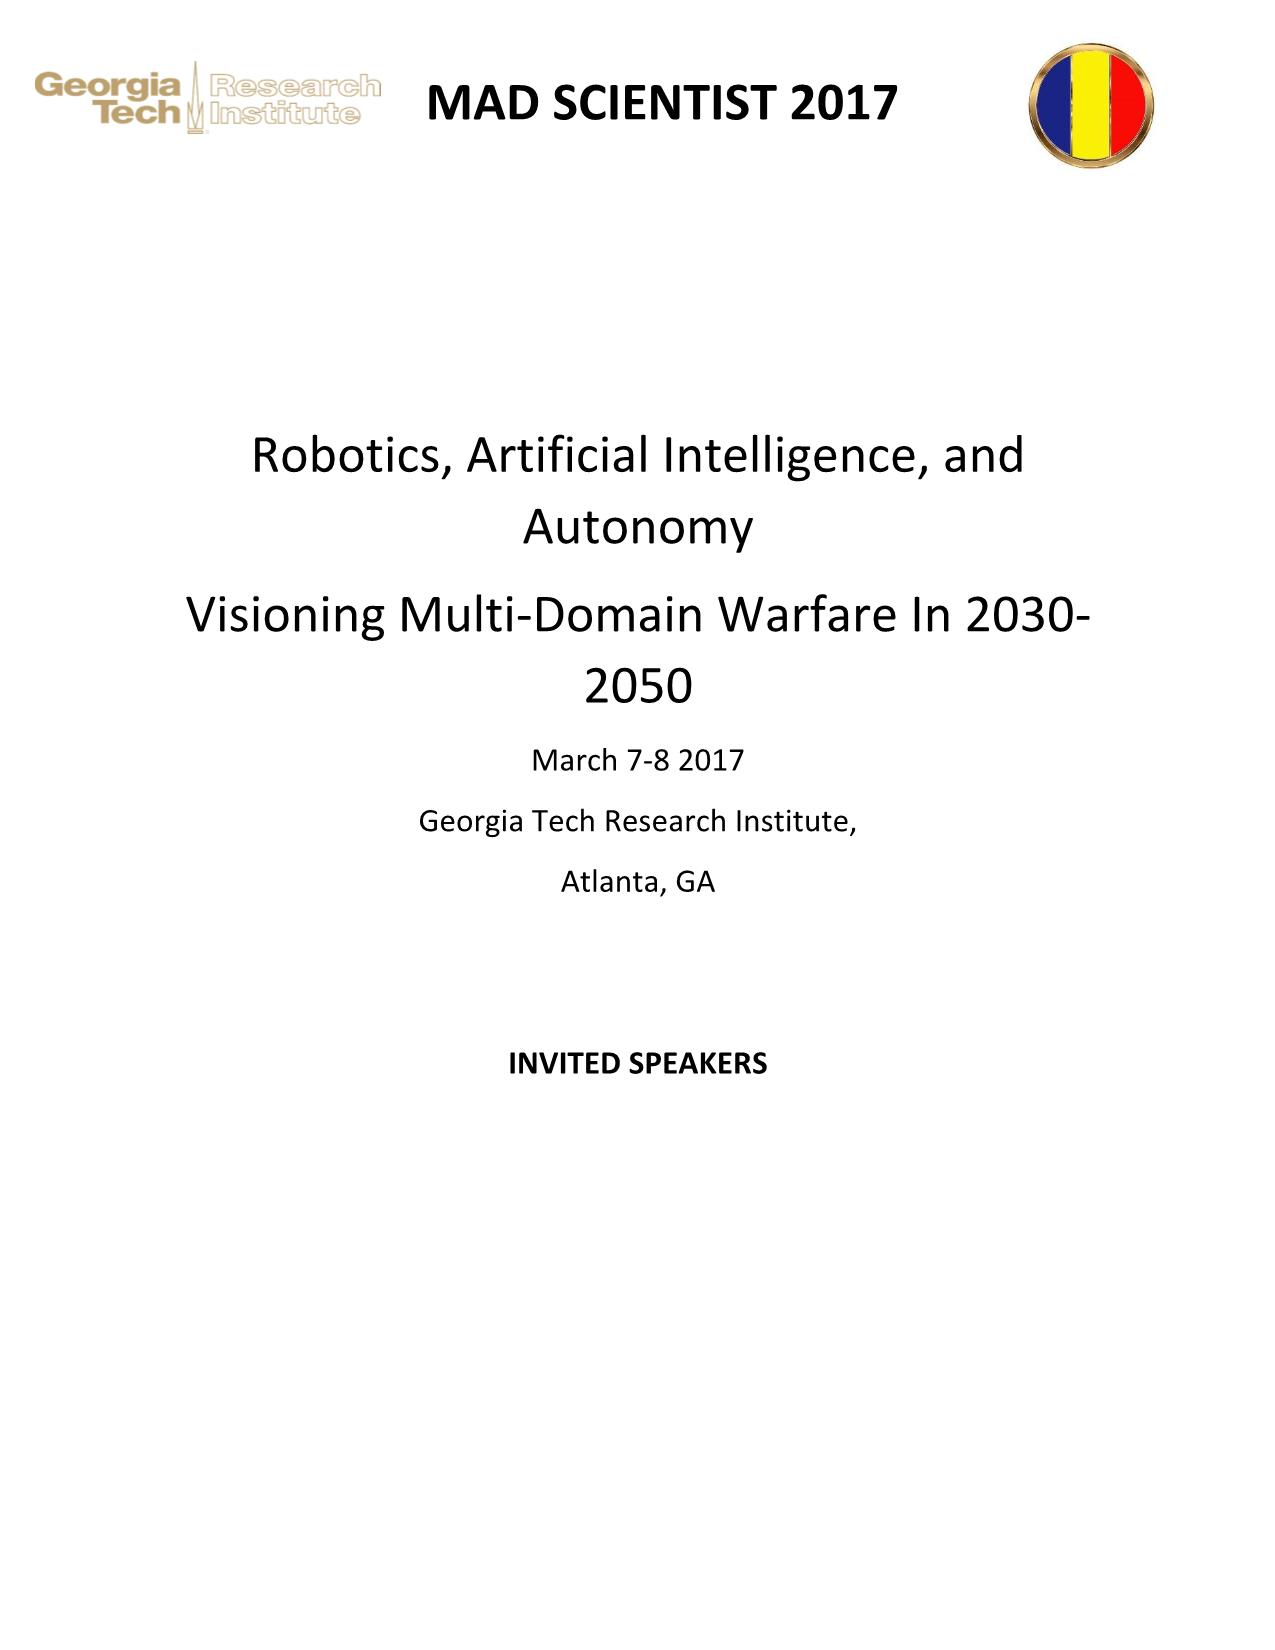 MS AI, Robotics, Autonomy GTRI Conference Speaker's Official Bios